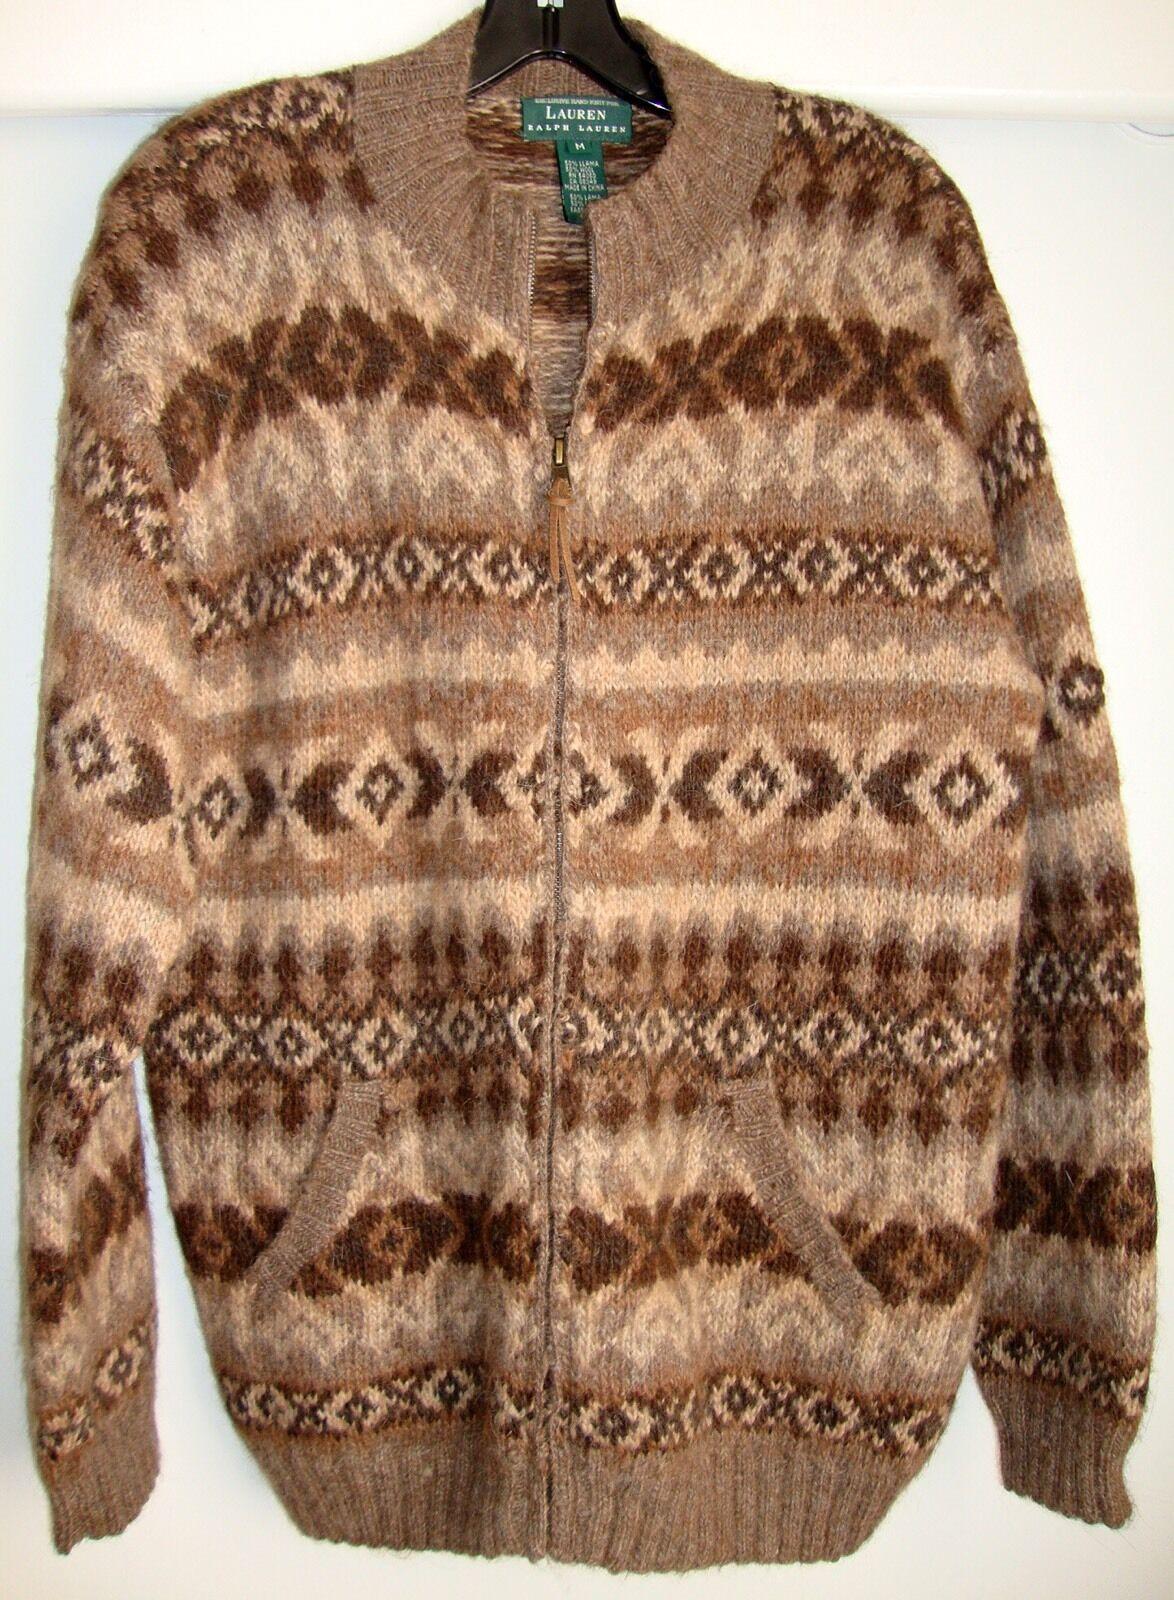 Ralph Lauren Hand Knit Sweater Size Medium Fair Isle Design Brown